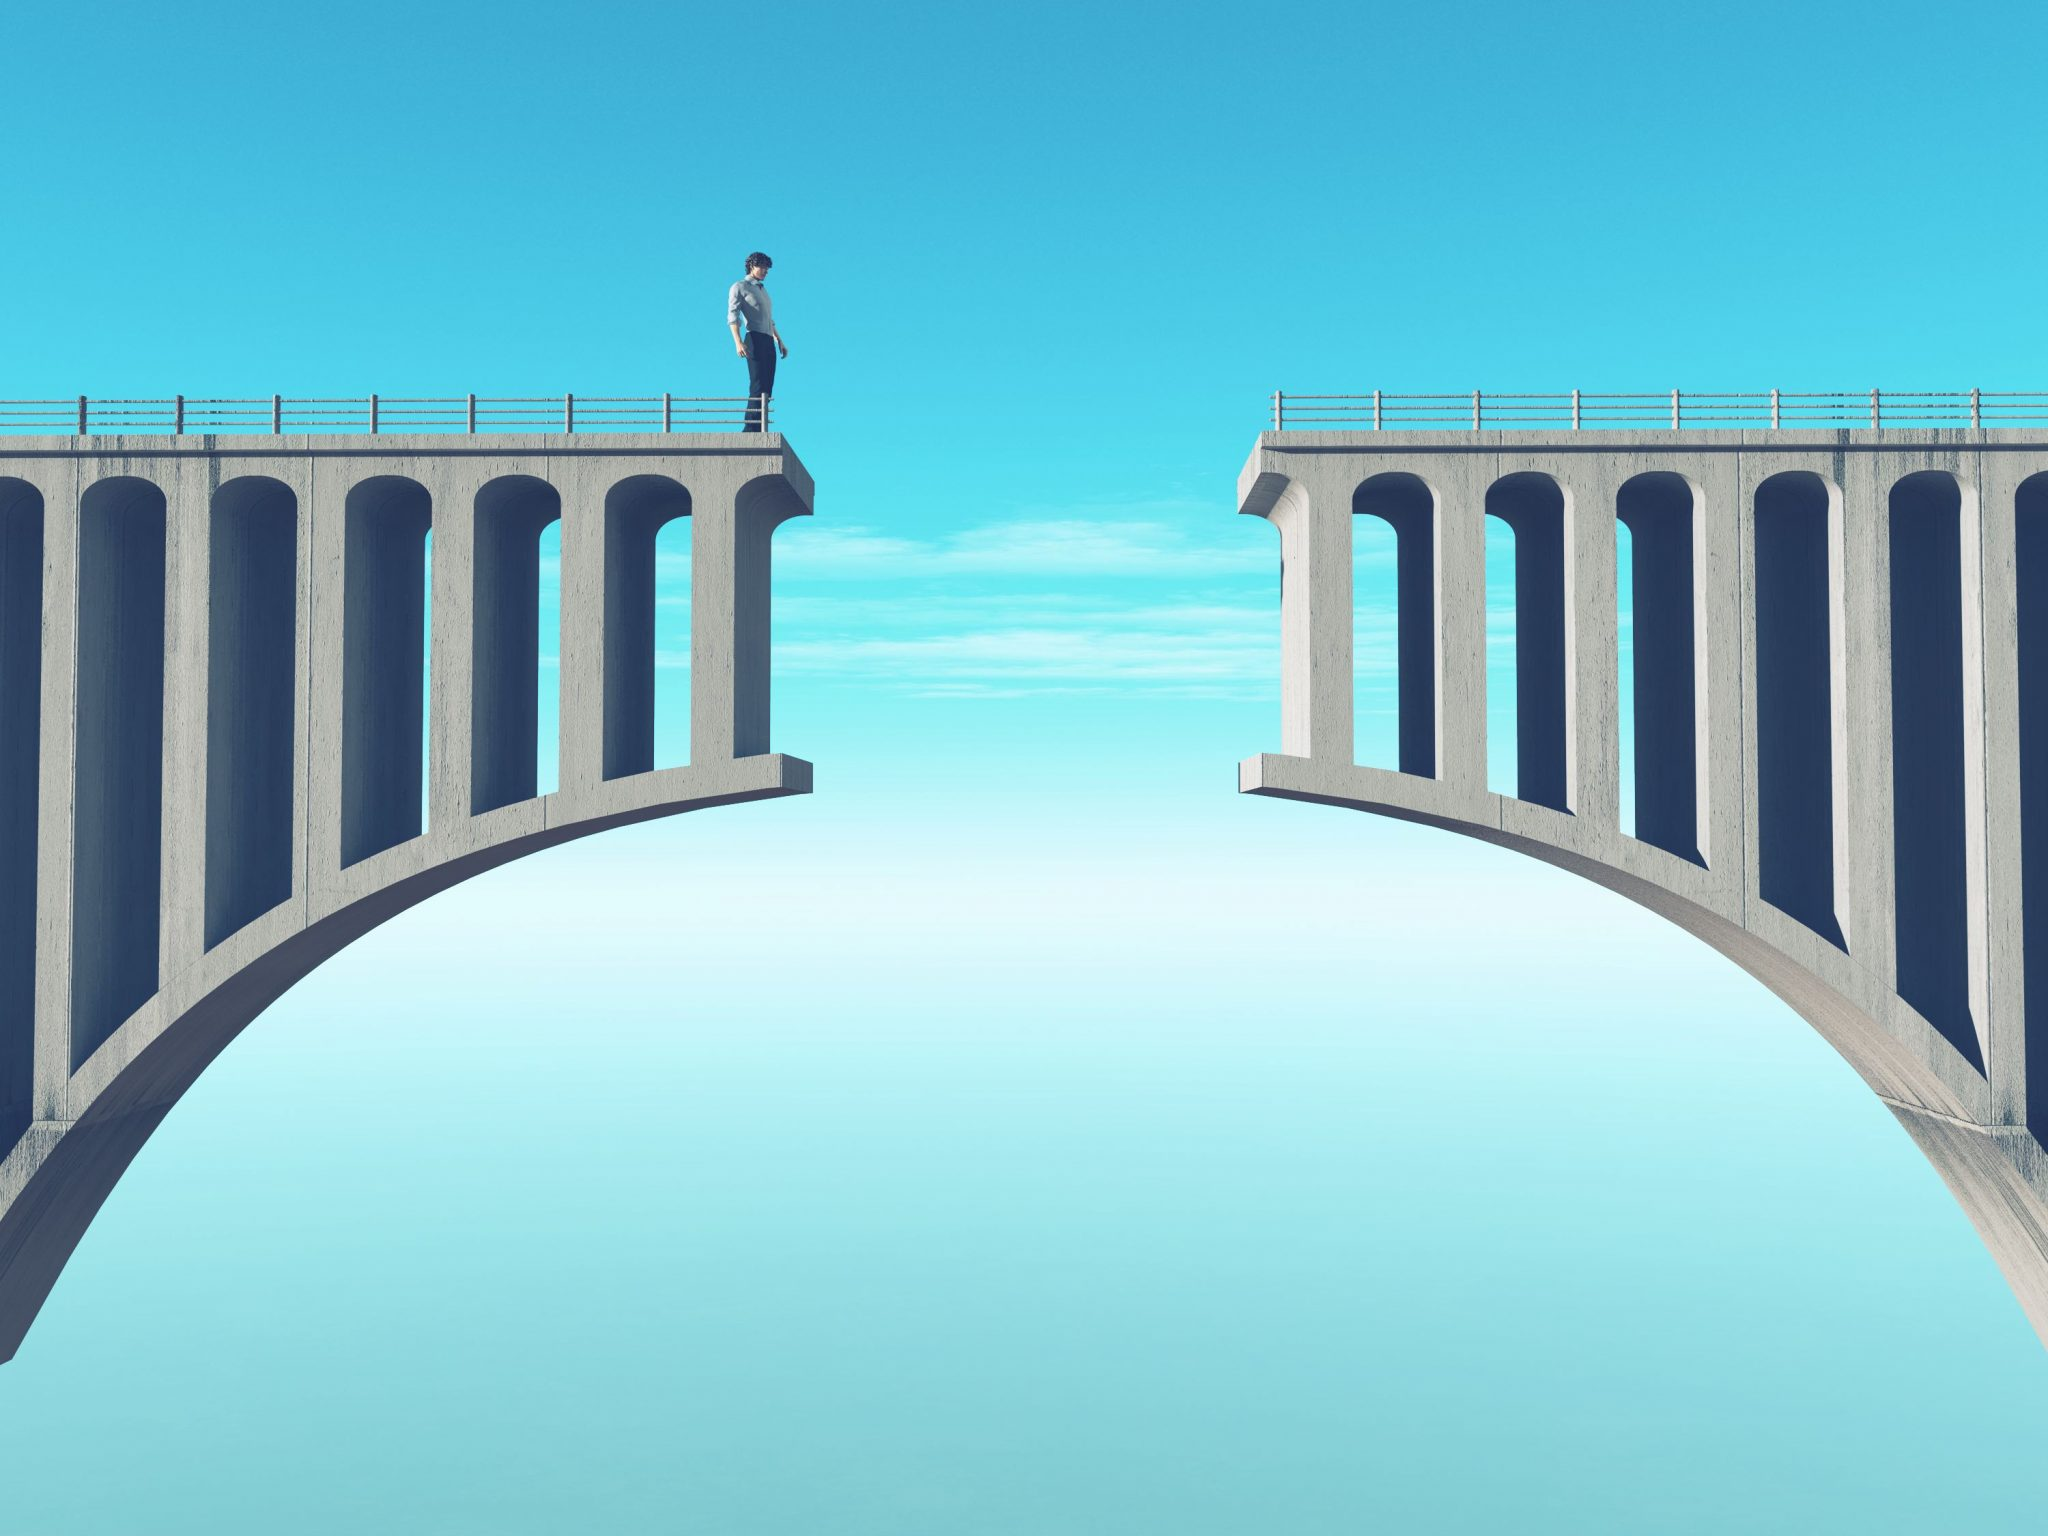 Man in front of a broken bridge - Capytech